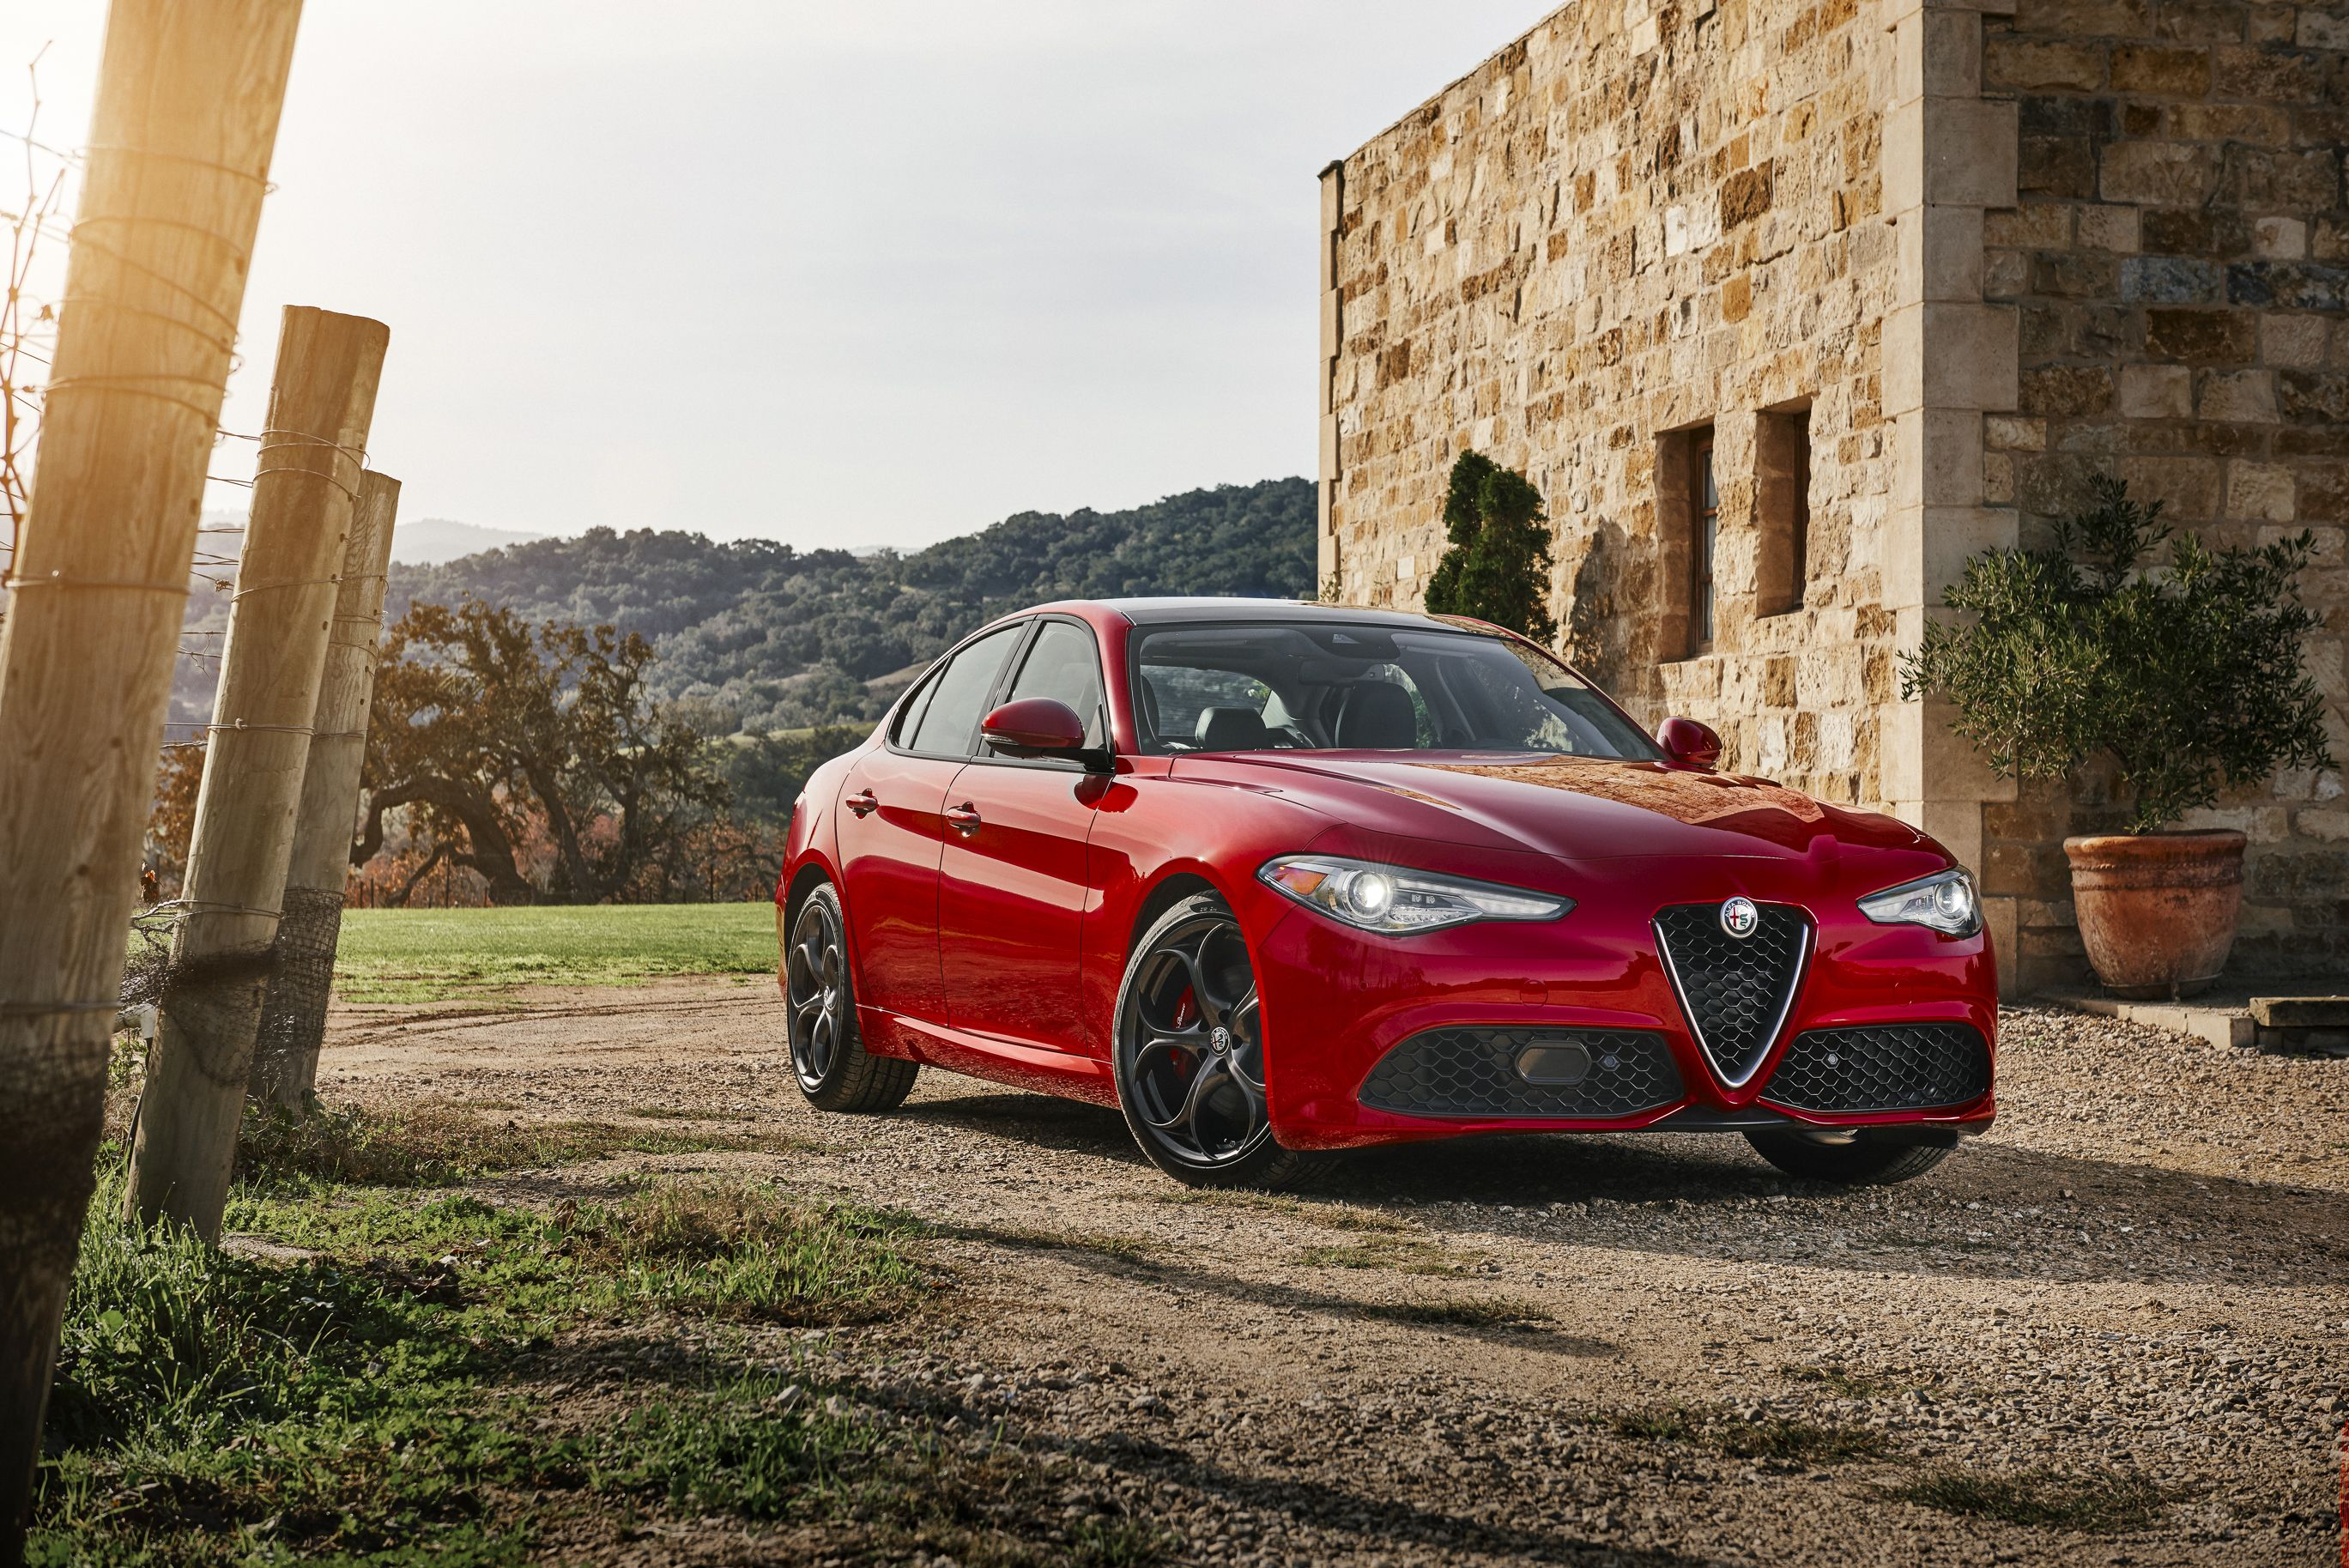 2017 Alfa Romeo Giulia Ti Sport Q4 Small Luxury Cars Alfa Romeo Giulia Alfa Romeo